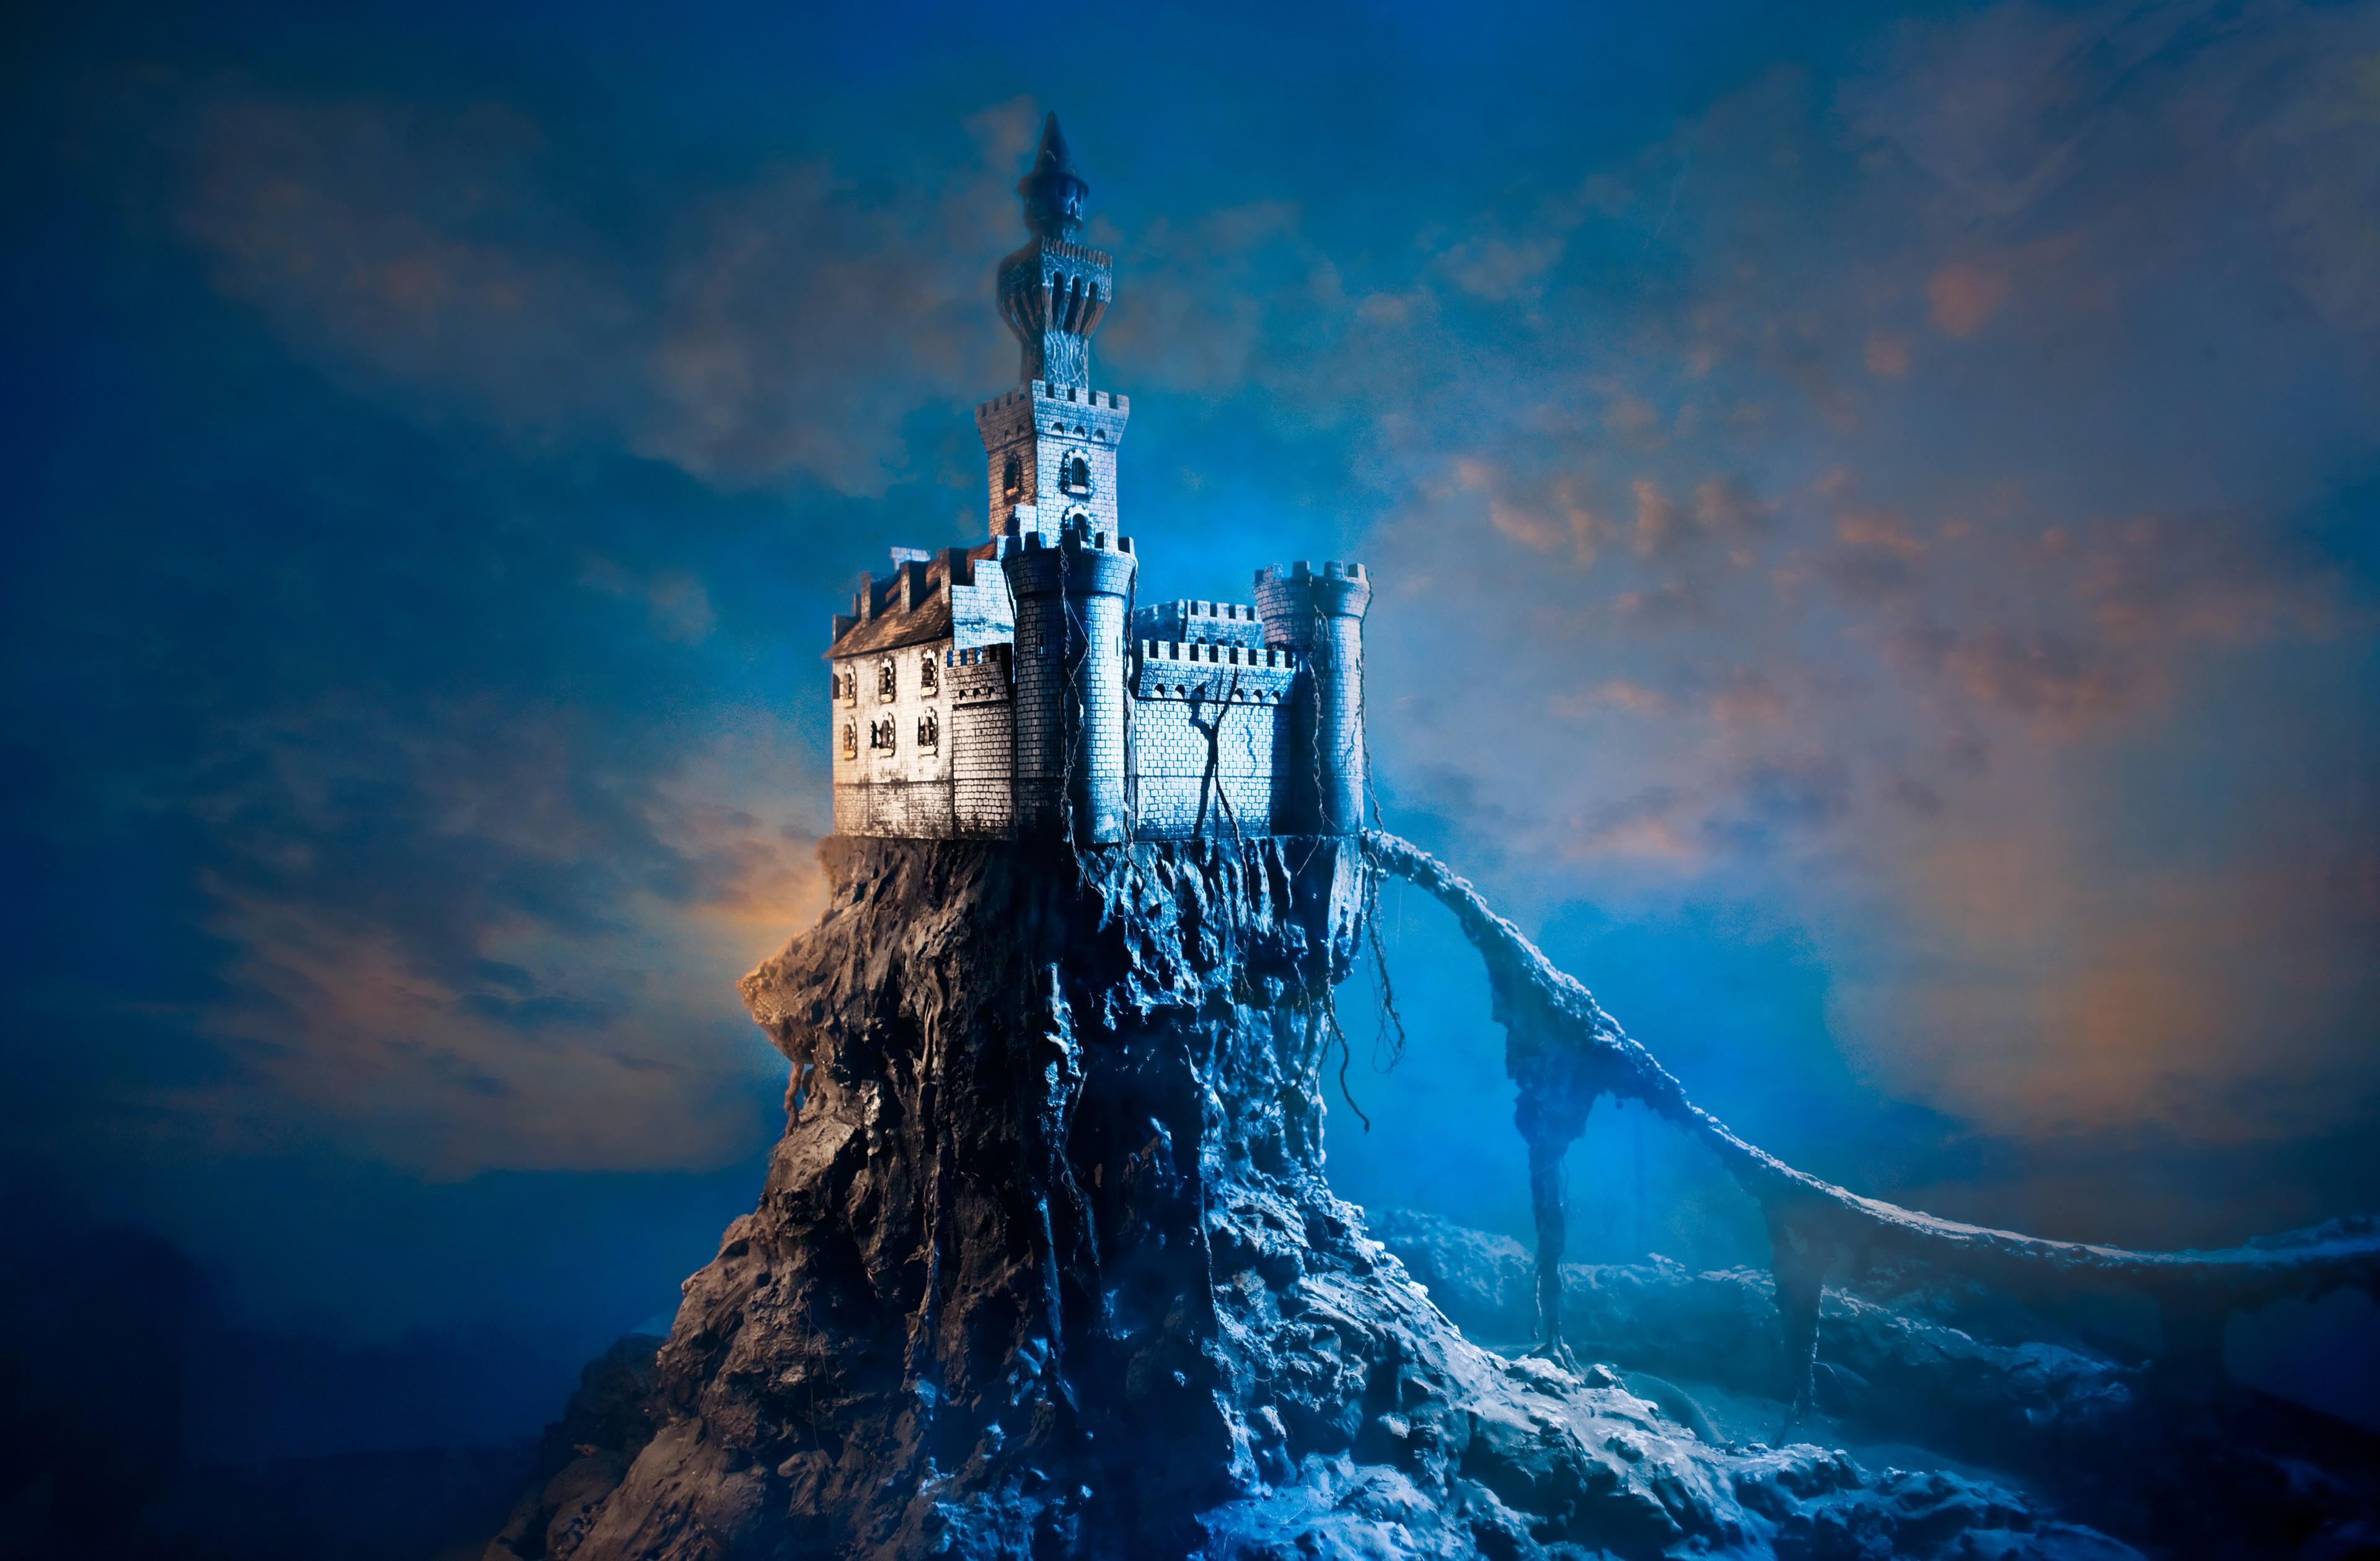 General 3840x2518 castle fantasy art sky digital art